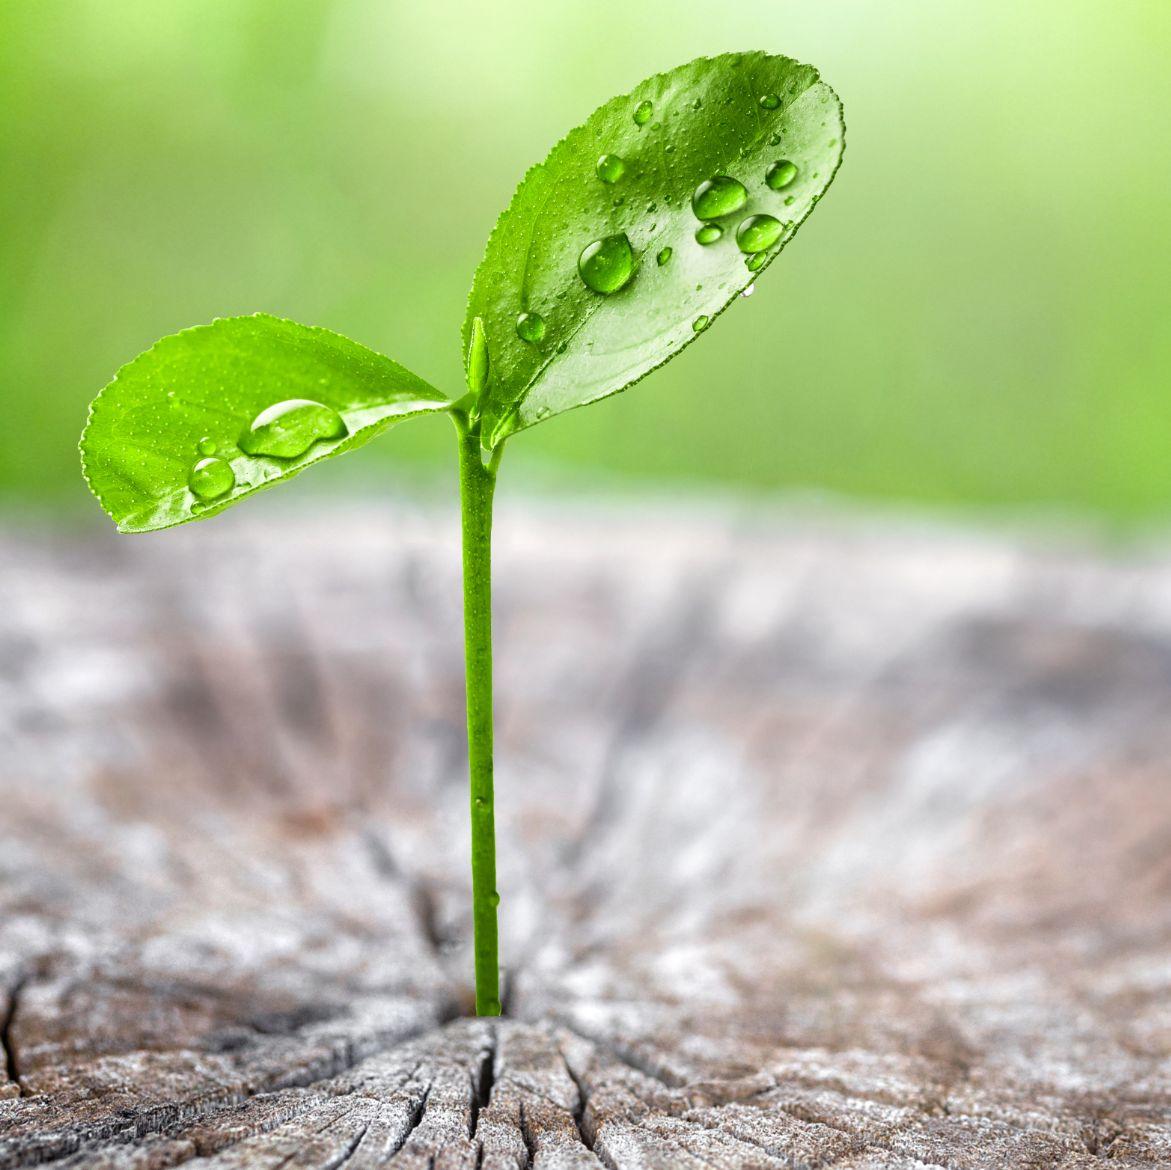 persoonlijke ontwikkeling anneke oliehoek plant druppel vierkant